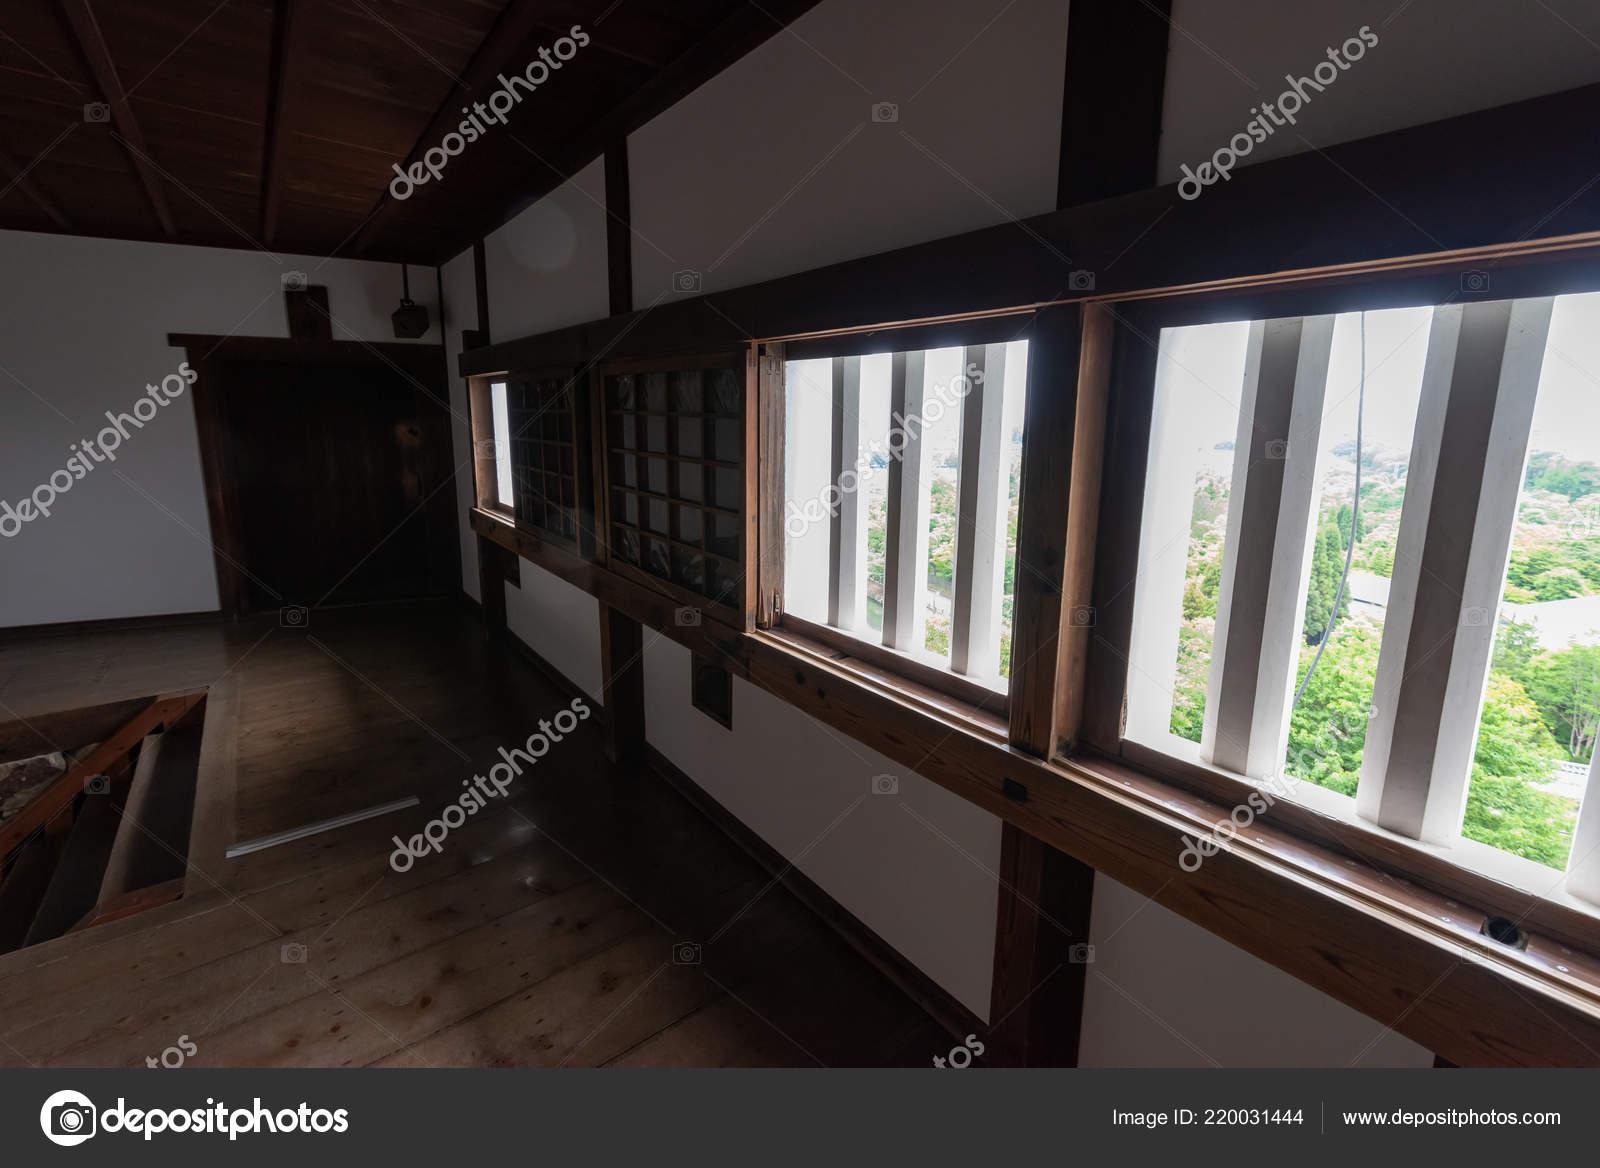 https://st4.depositphotos.com/1007171/22003/i/1600/depositphotos_220031444-stock-photo-himeji-japan-june-2017-interior.jpg